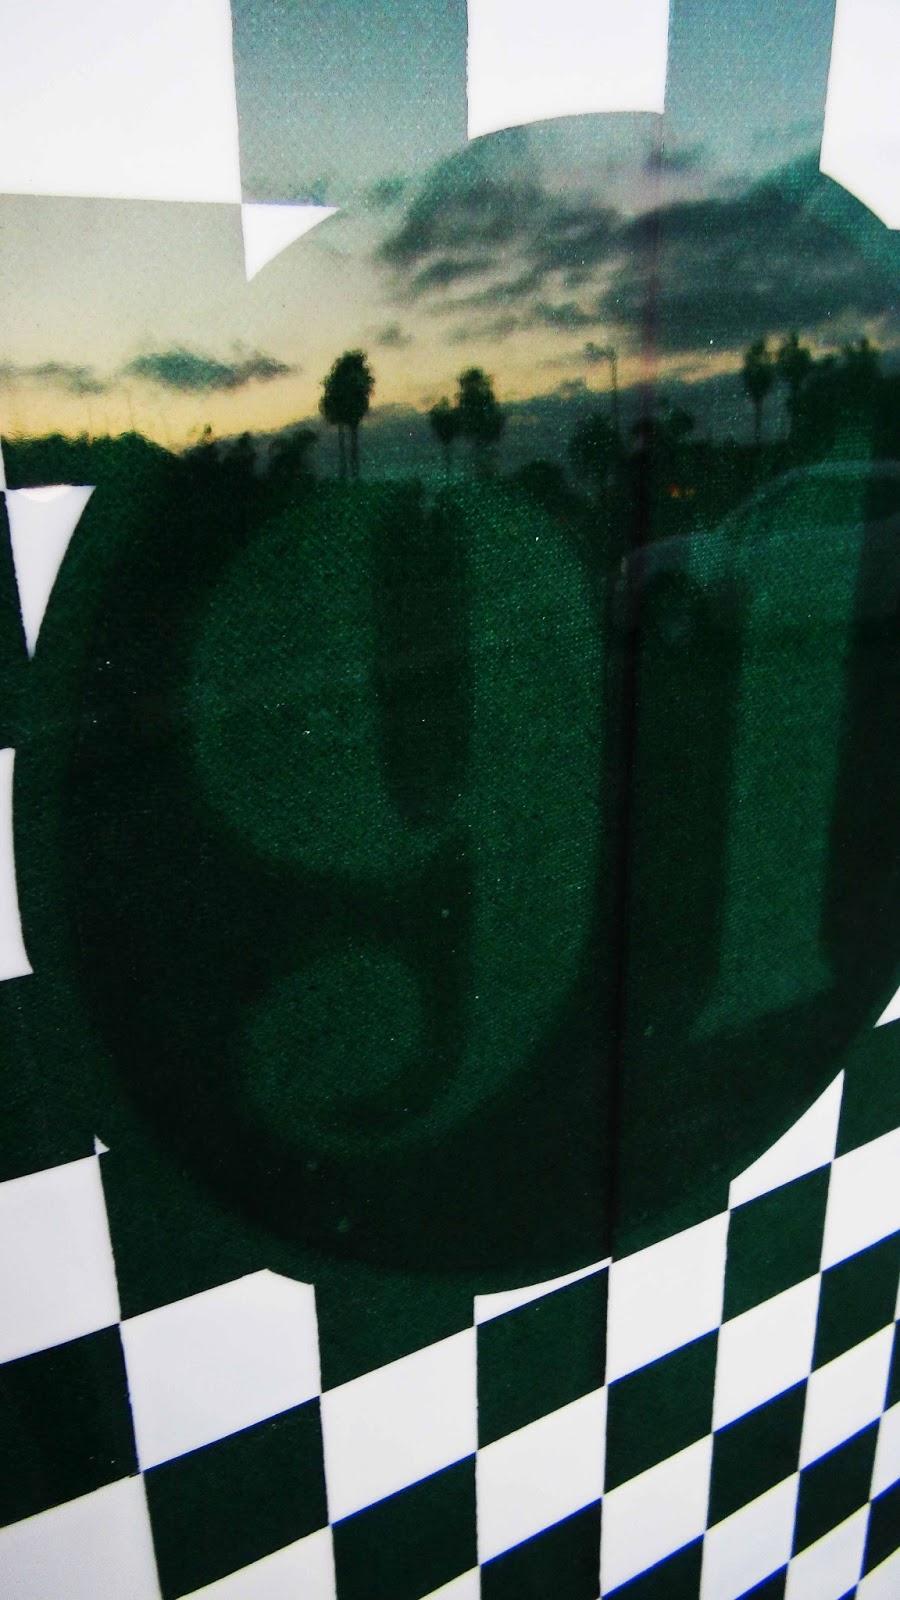 GLASS OR DIE///: Racing gloss coat tint, 100% resin, fuck